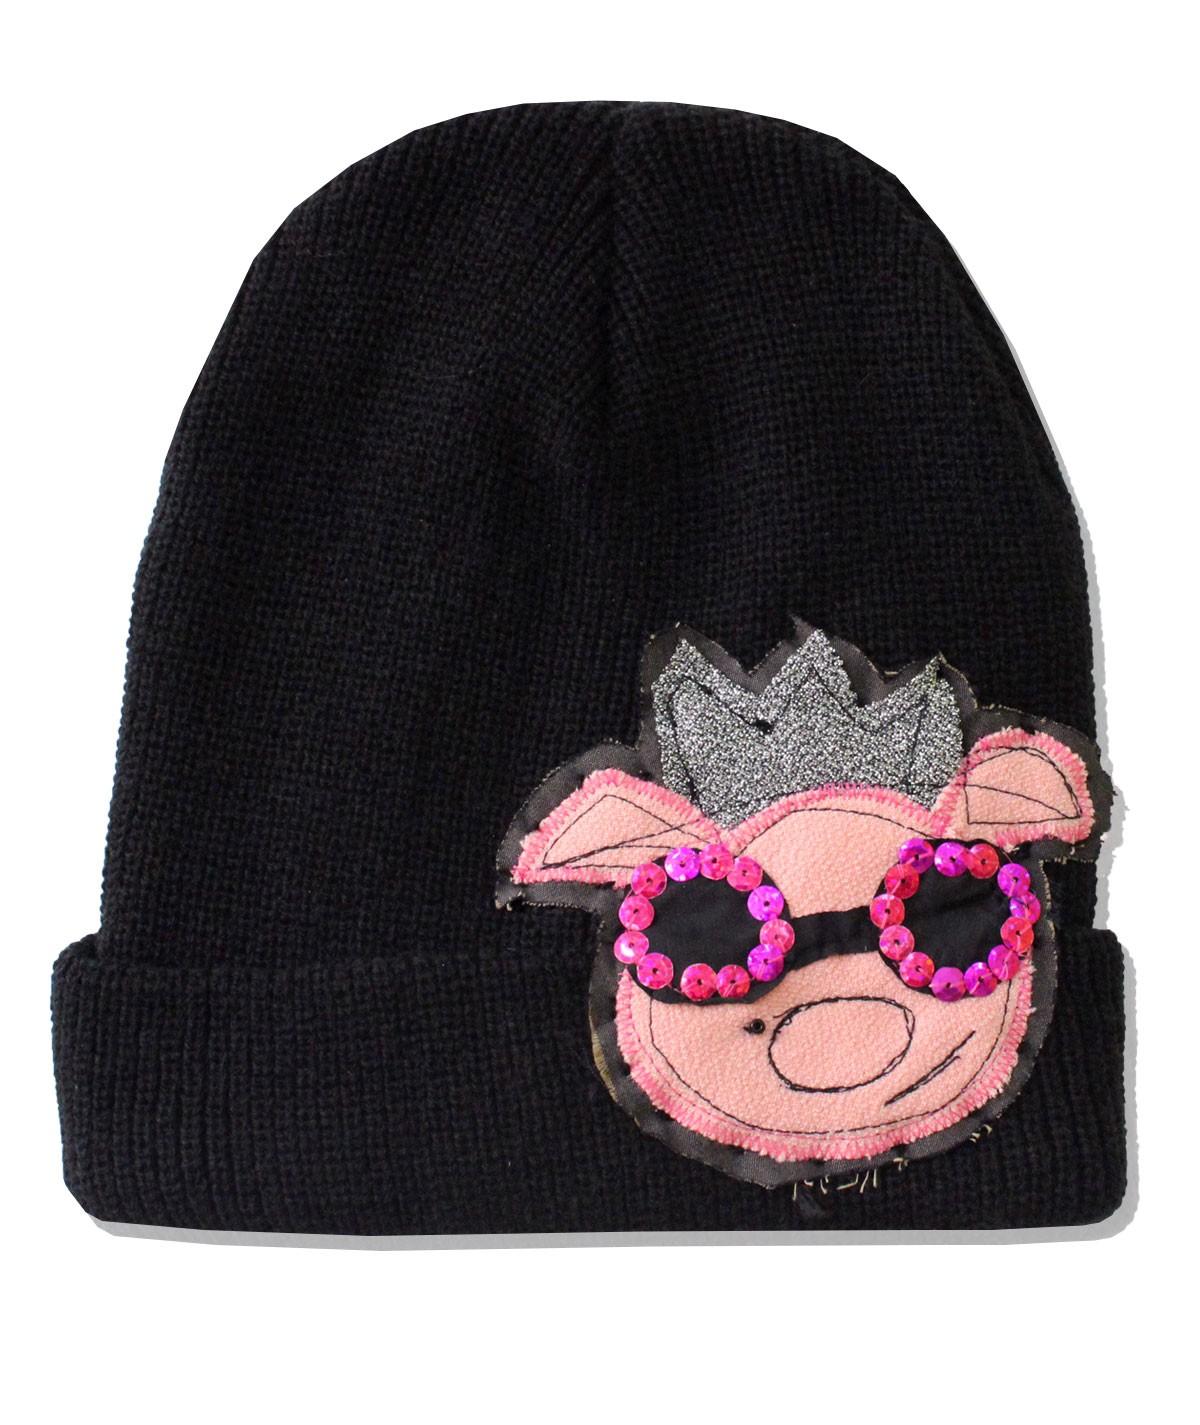 Piglet - hat